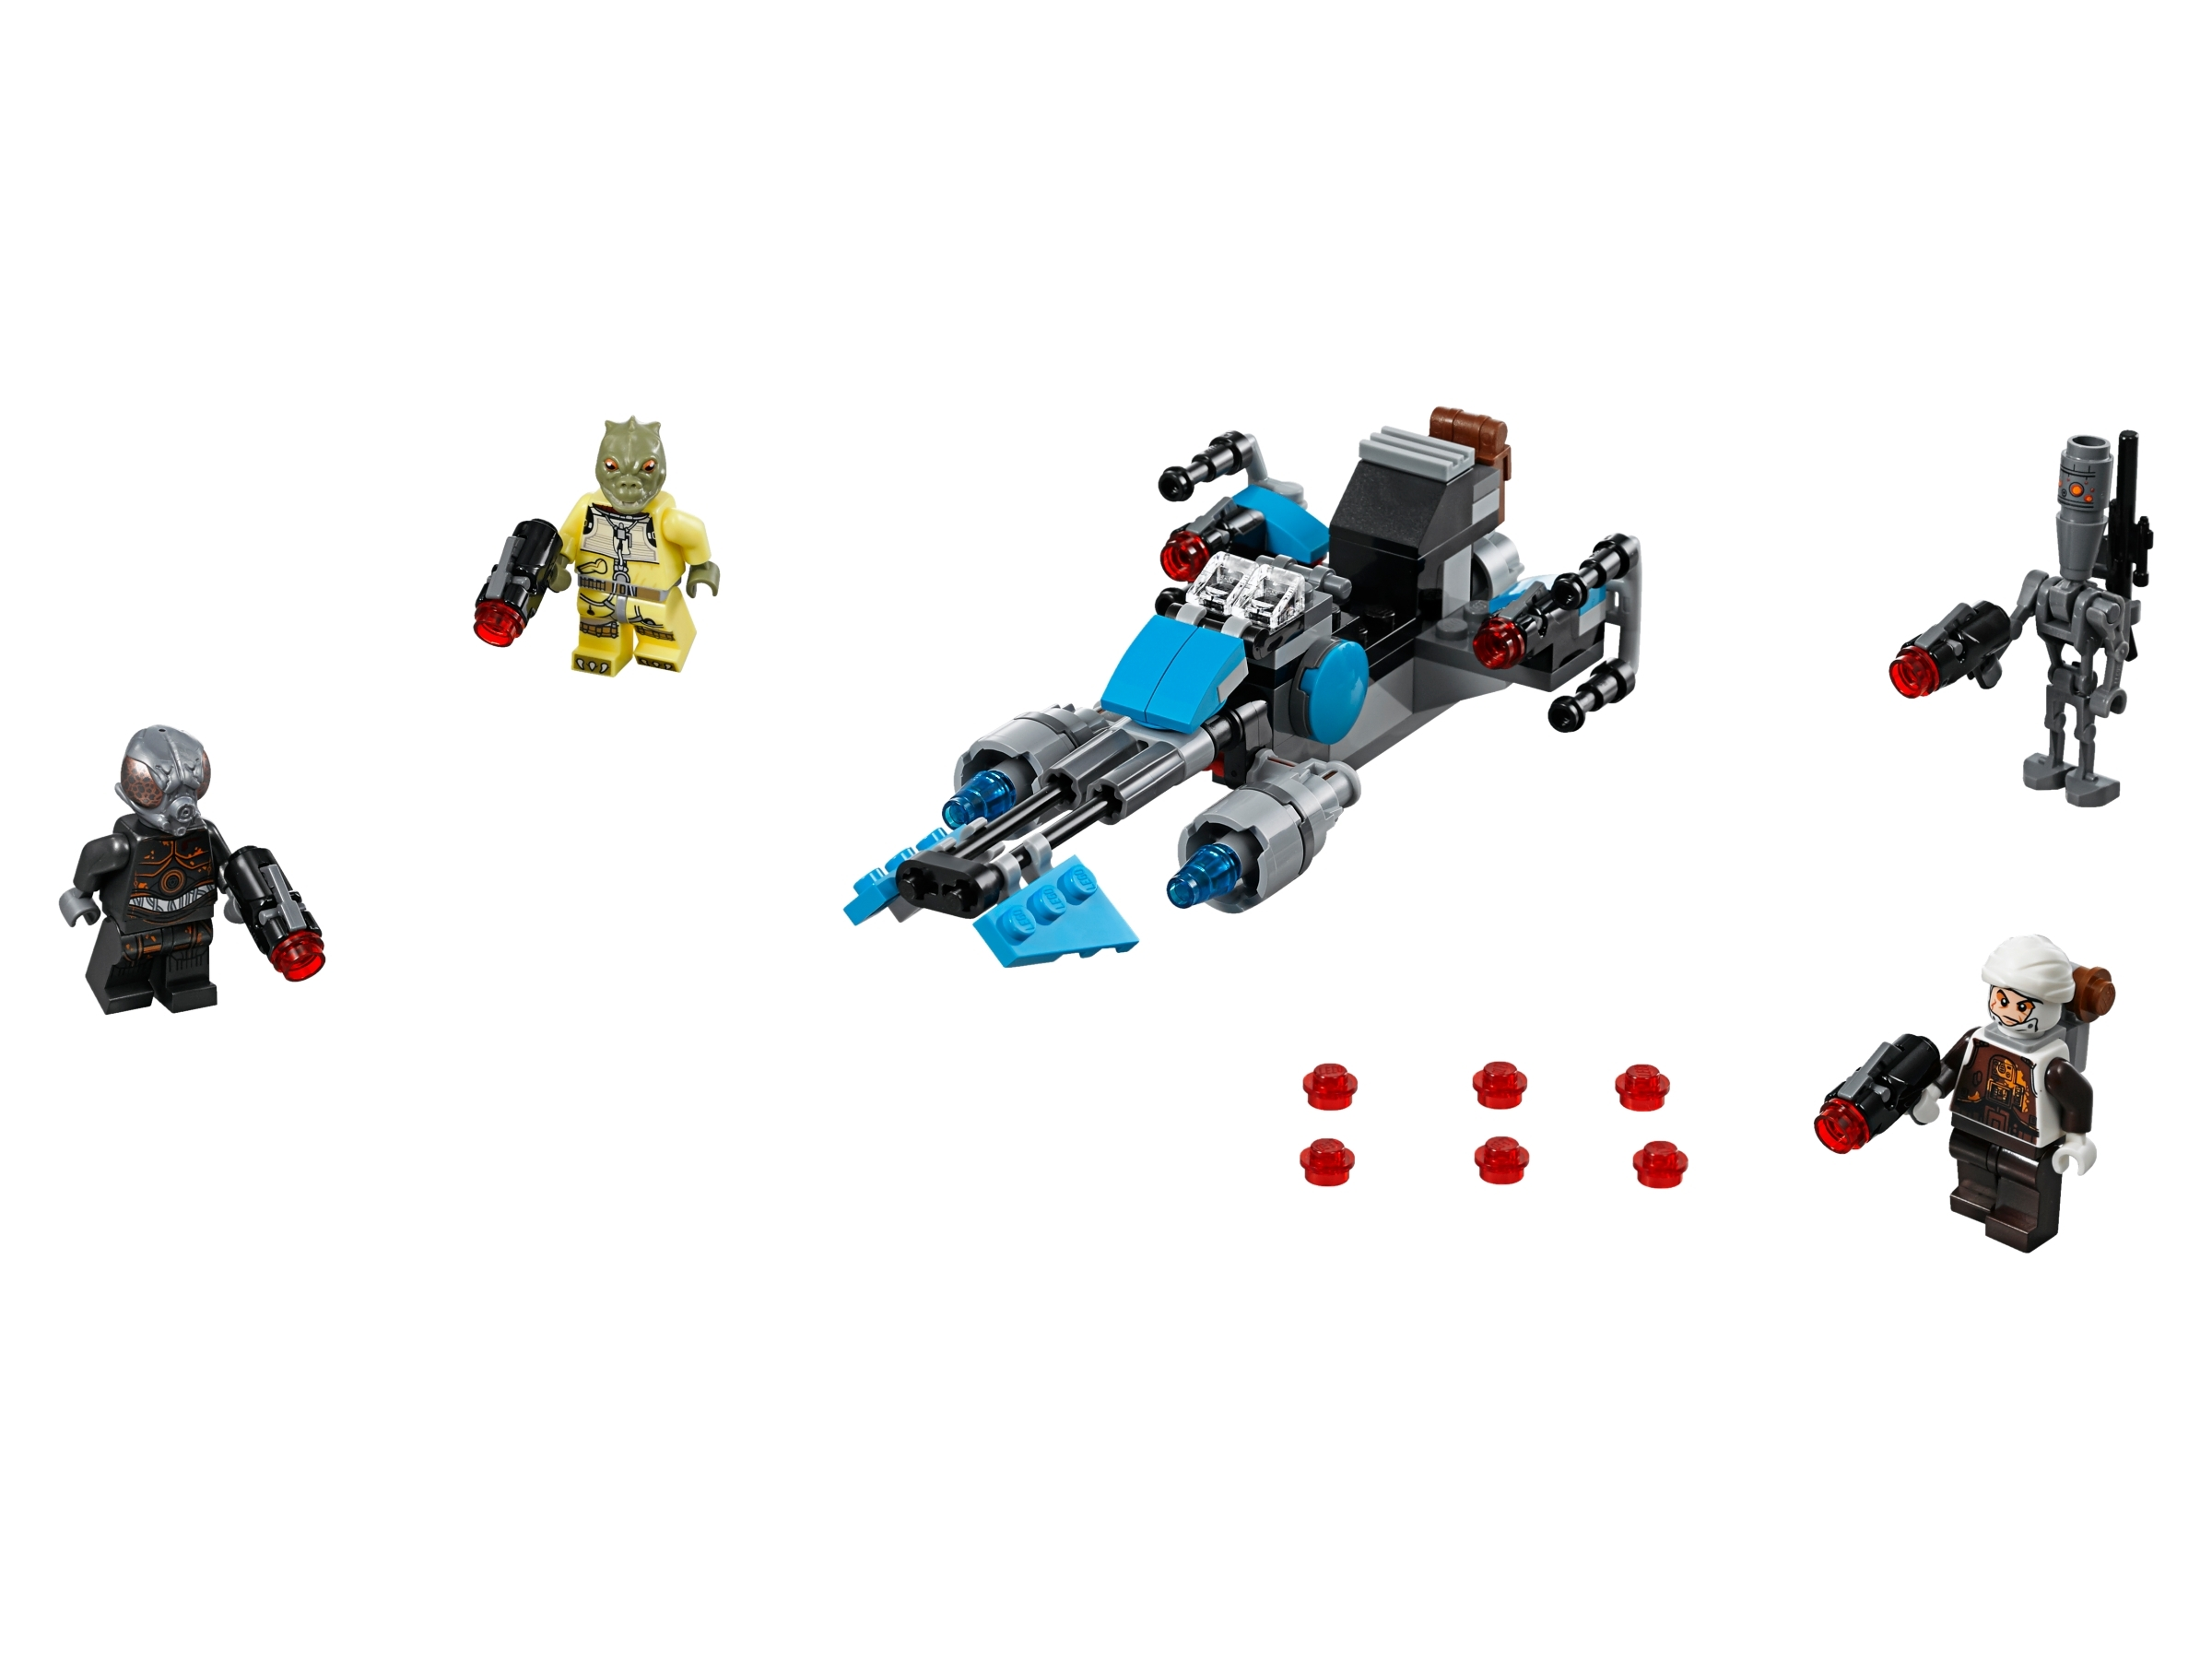 LEGO Star Wars Dengar Authentic Bounty Hunter w// Blaster from 75167 NEW